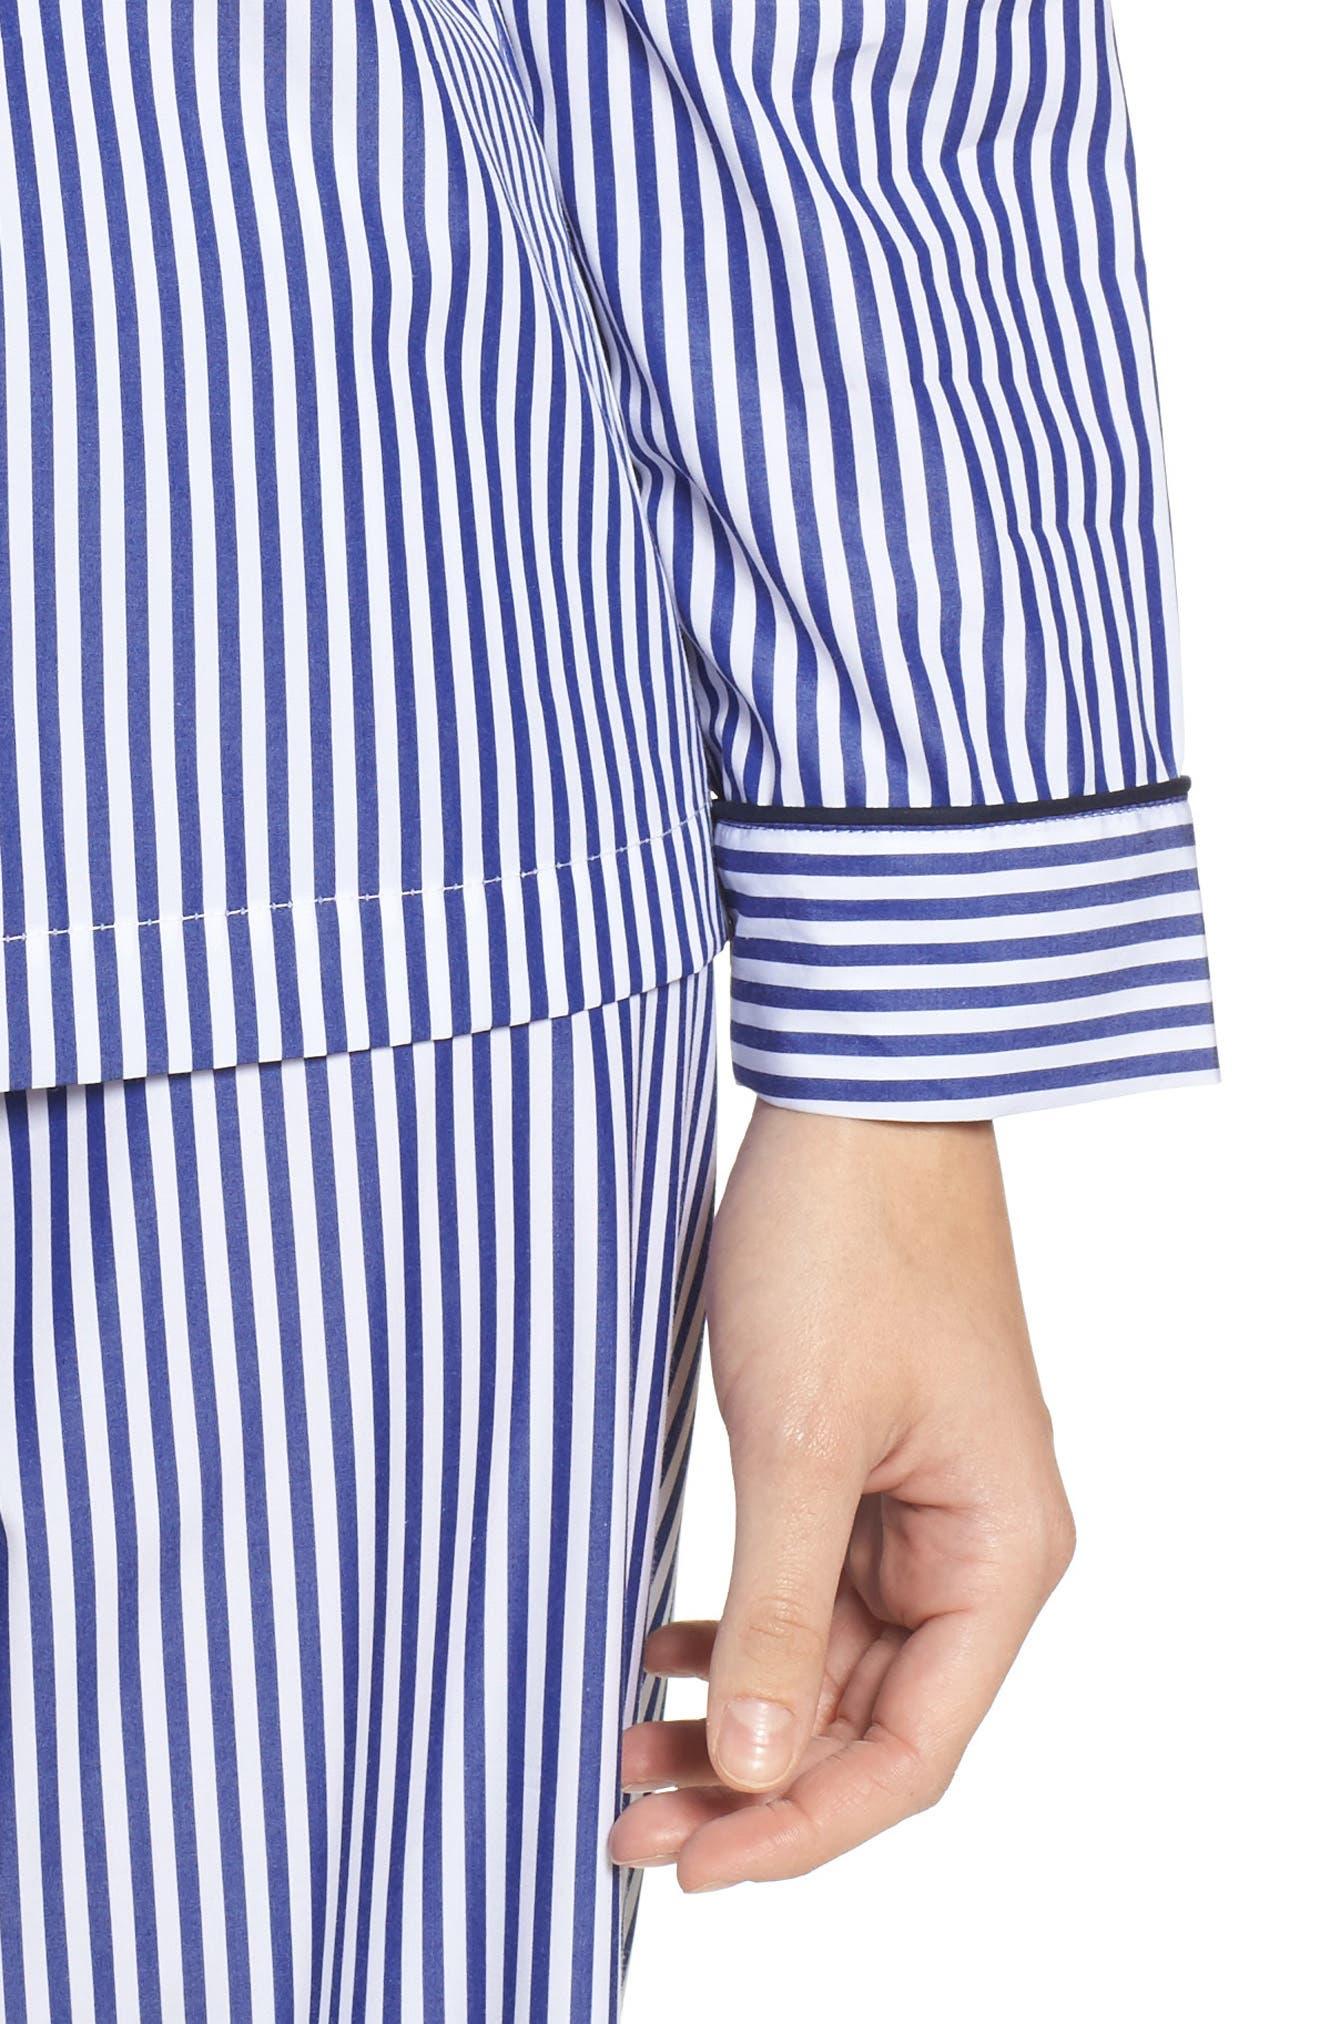 Stripe Pajamas,                             Alternate thumbnail 4, color,                             Navy Stripe